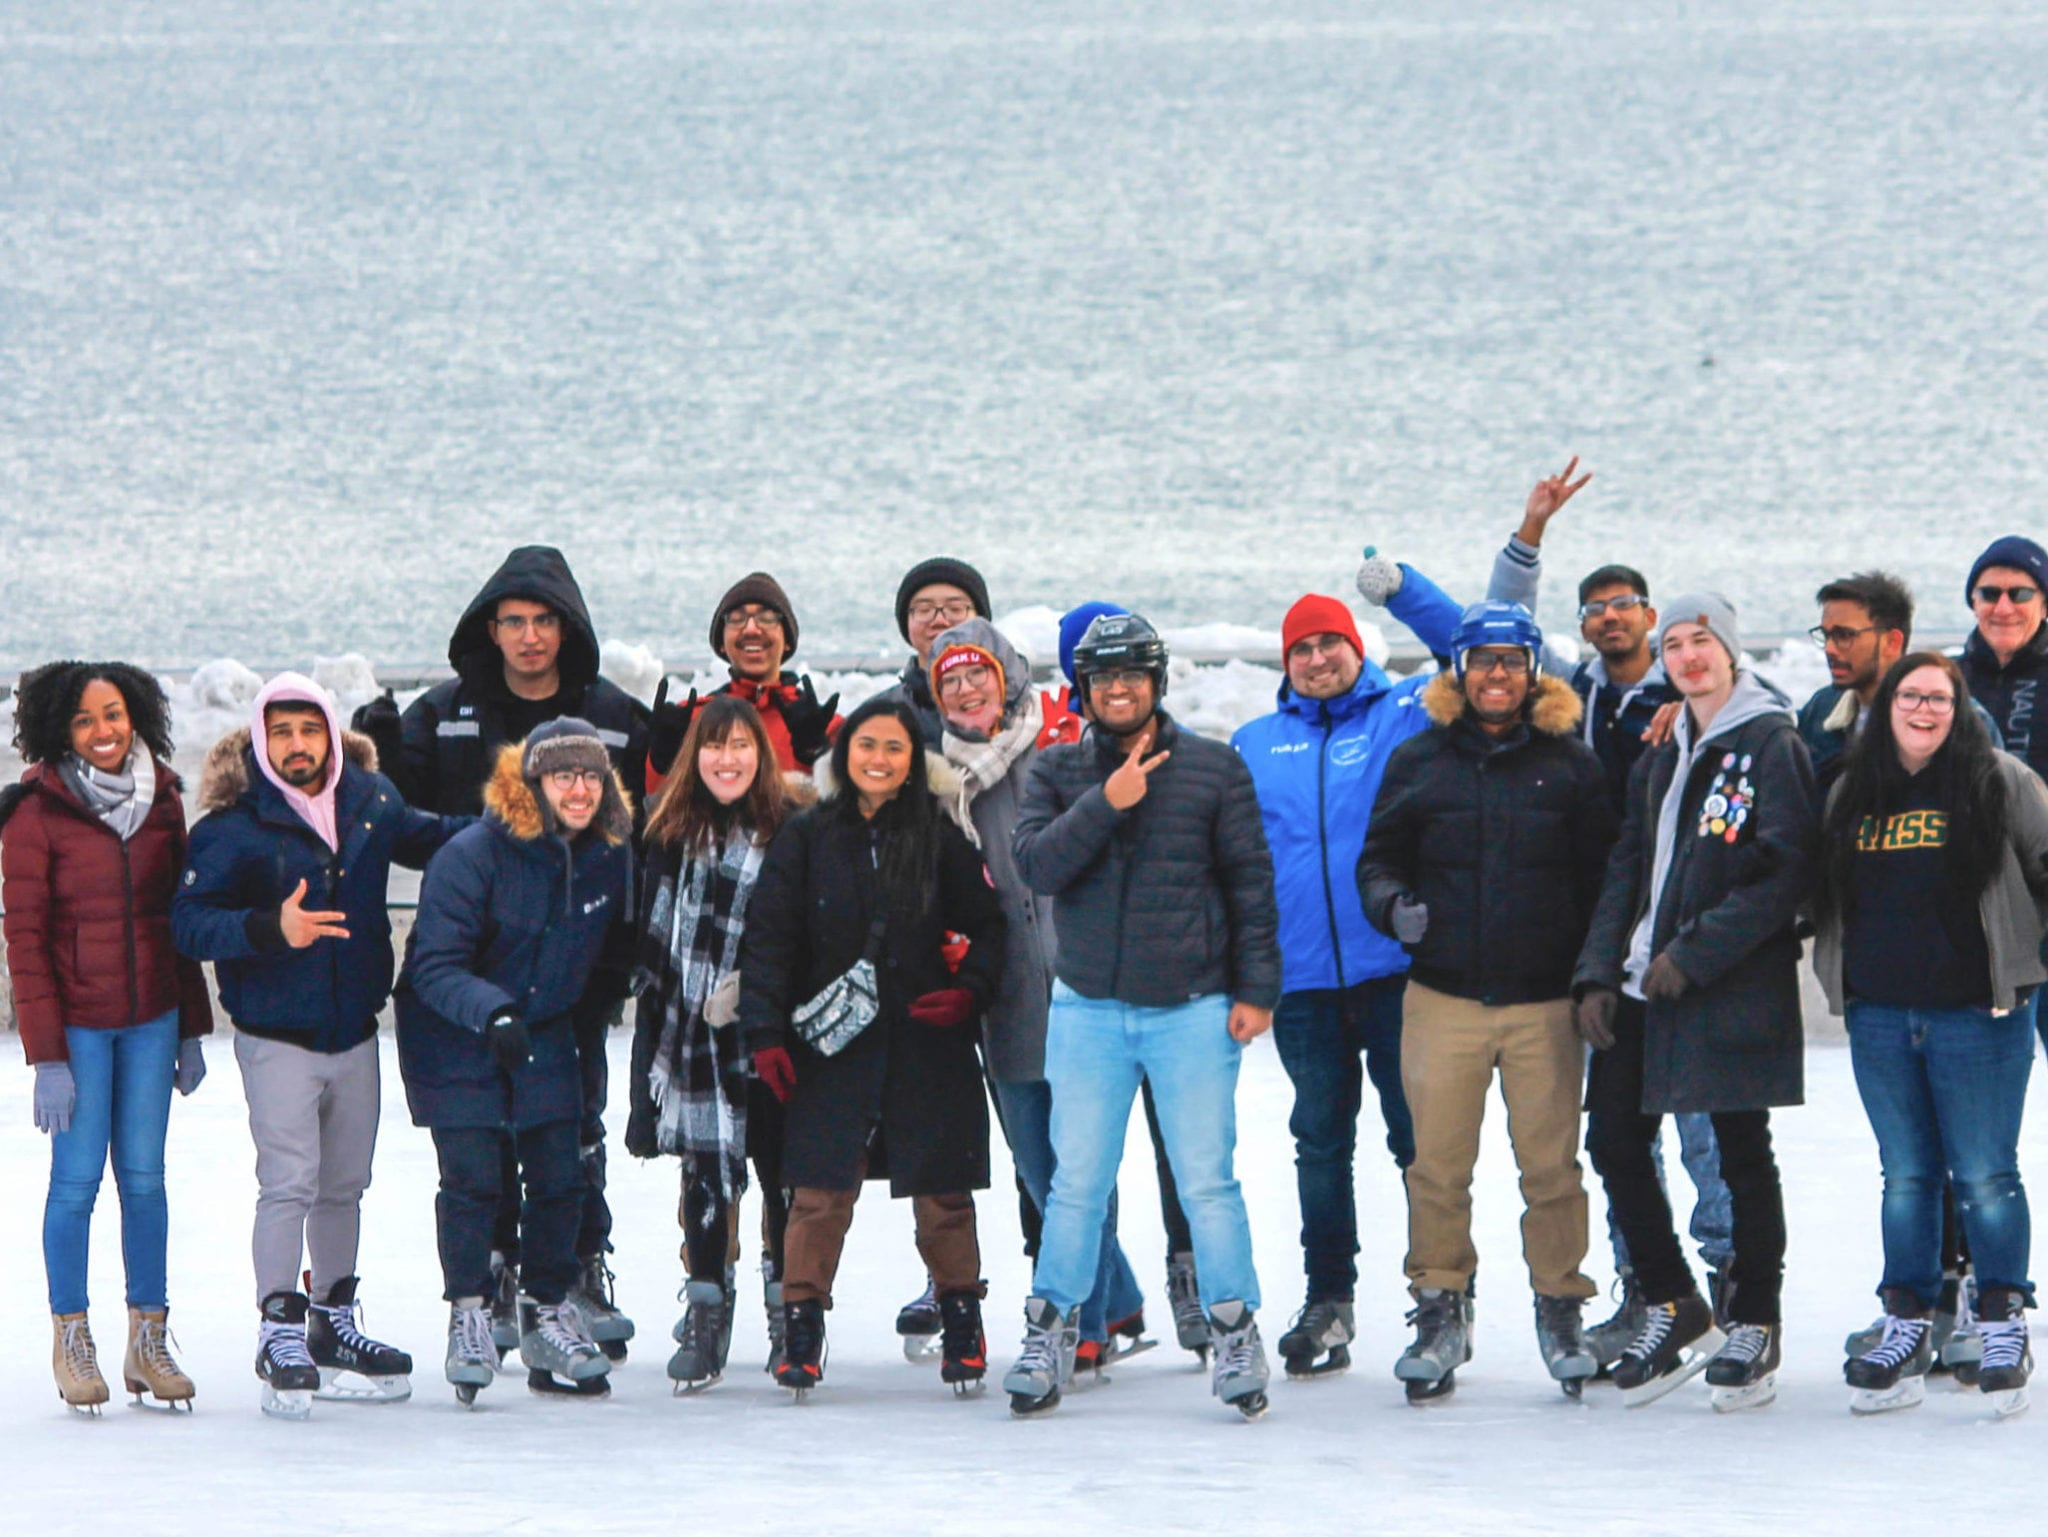 Group of people skating